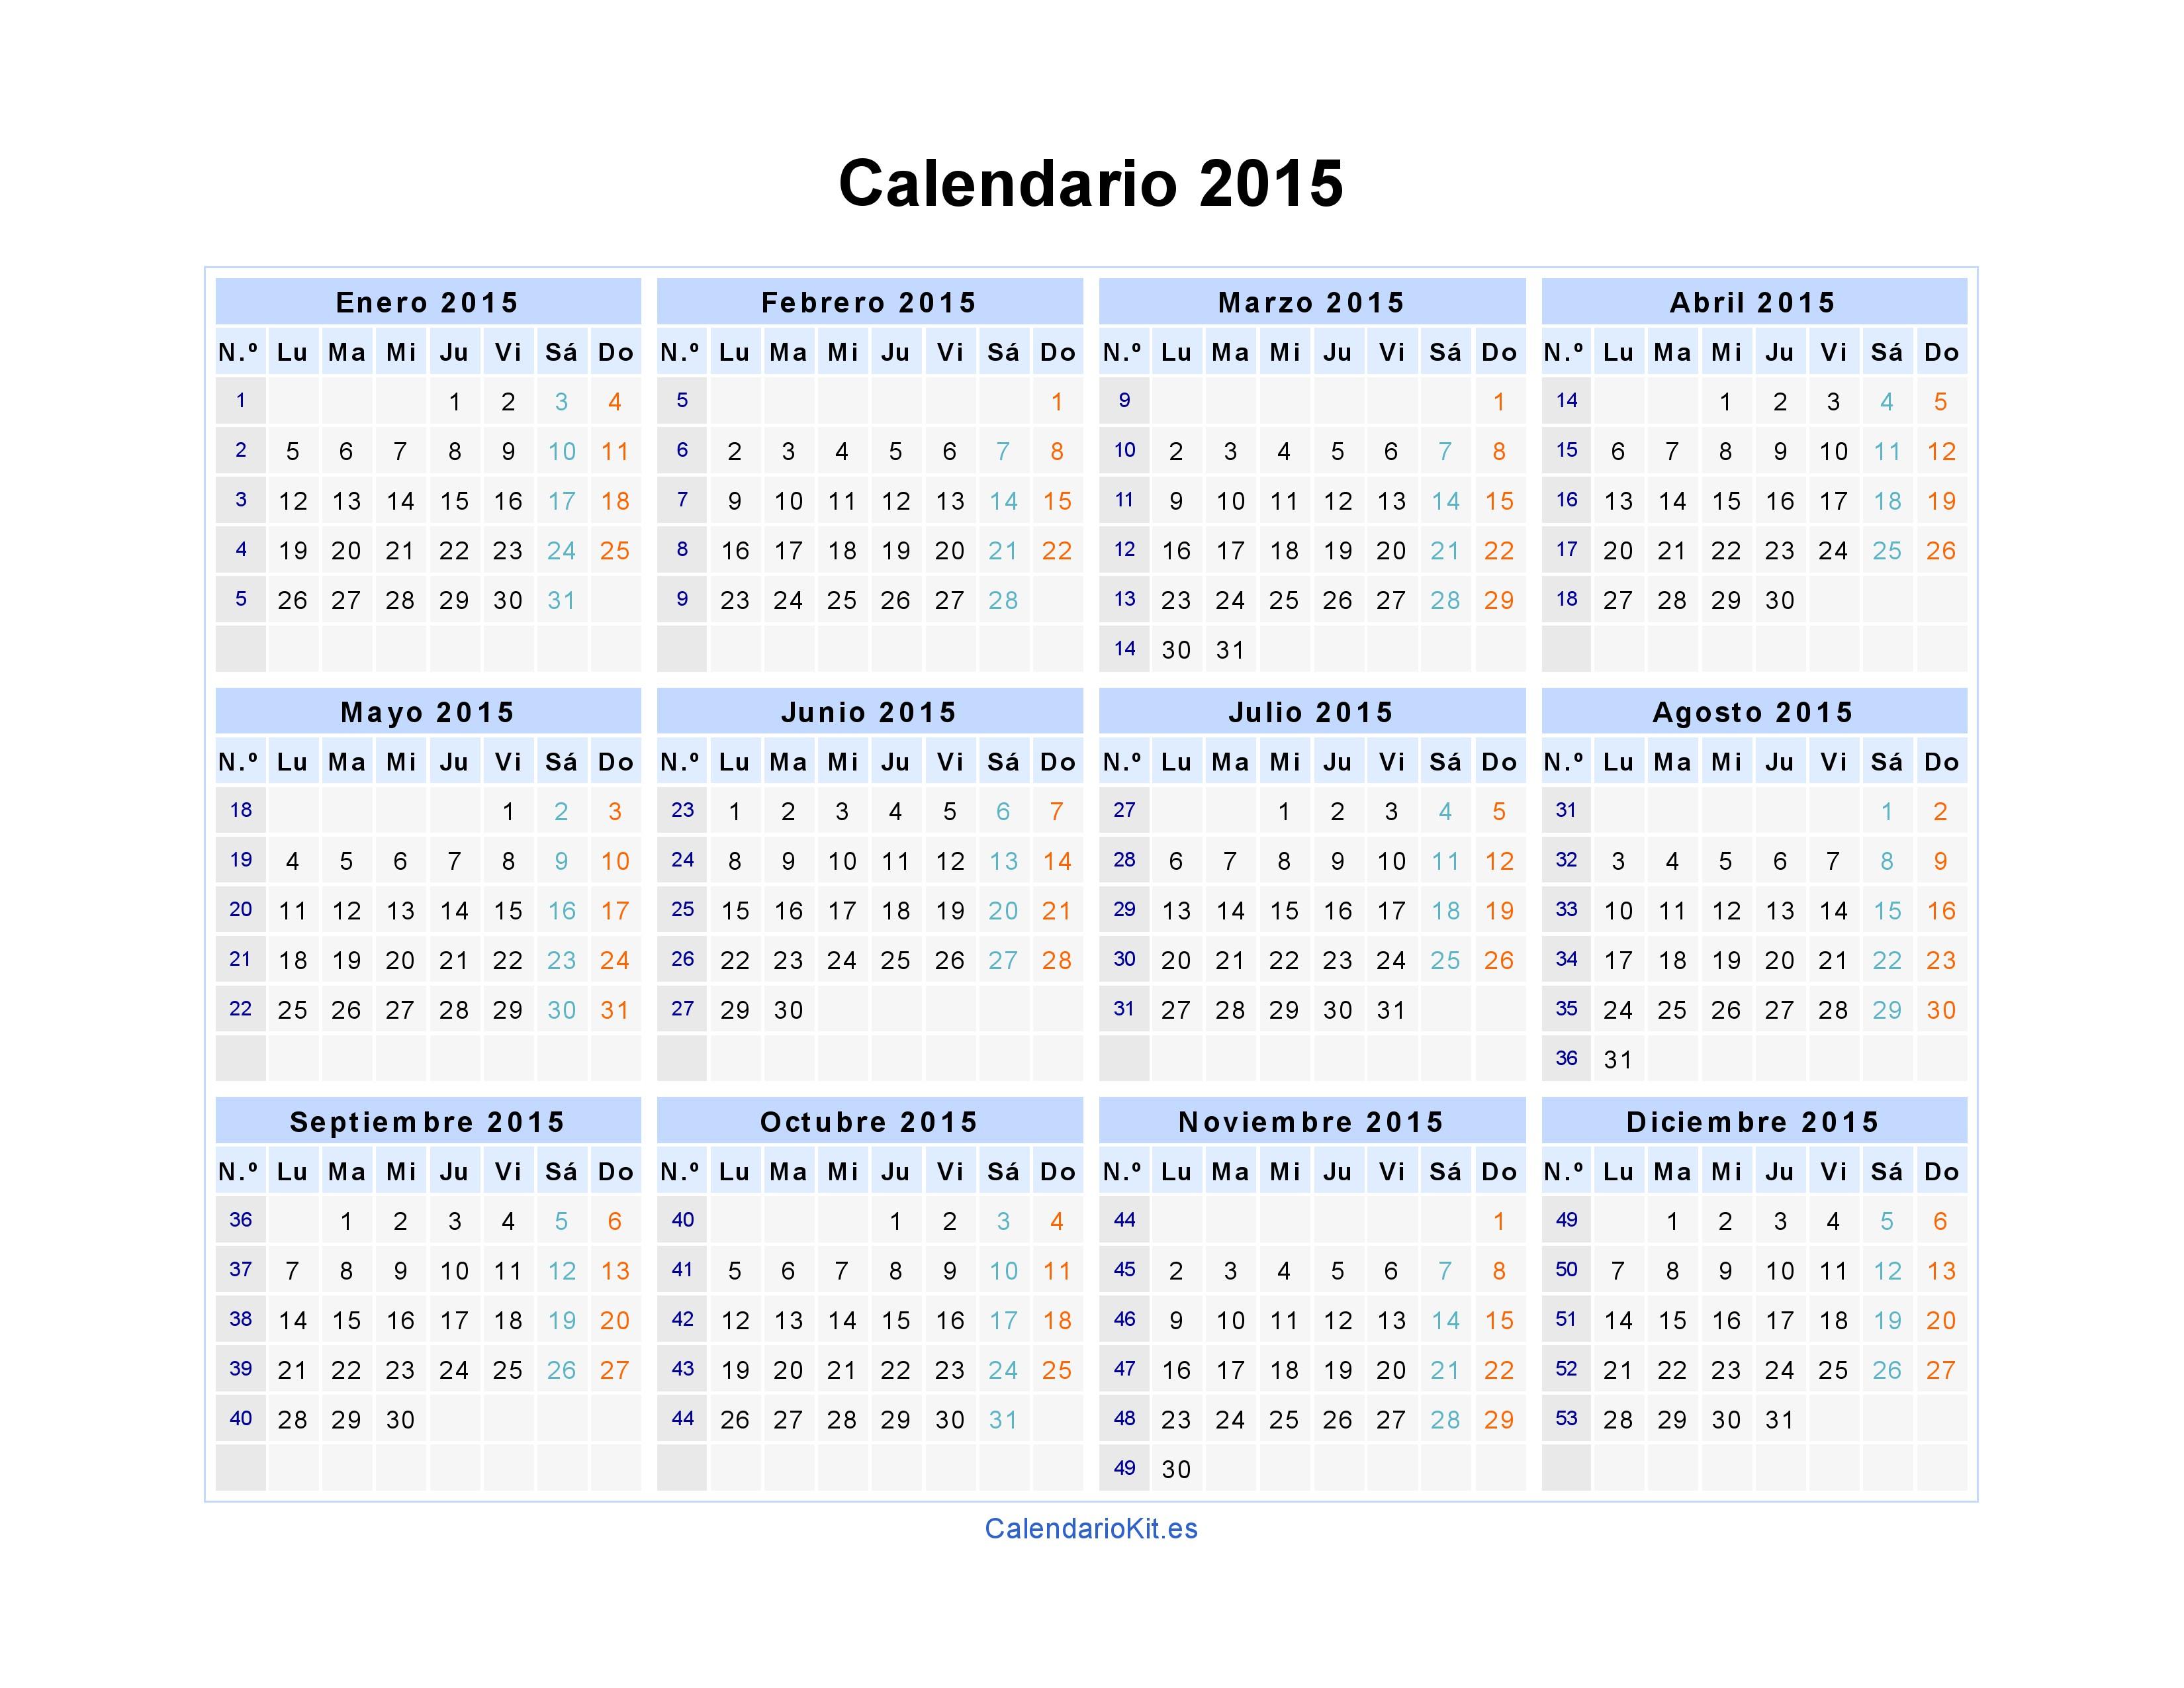 Calendario Diciembre 2017 Para Imprimir Con Festivos Recientes Calendario 2016 Excel Calendario Mensual 2015 Excel Calendario Of Calendario Diciembre 2017 Para Imprimir Con Festivos Más Actual Mejores 41 Imágenes De Tarjetas En Pinterest